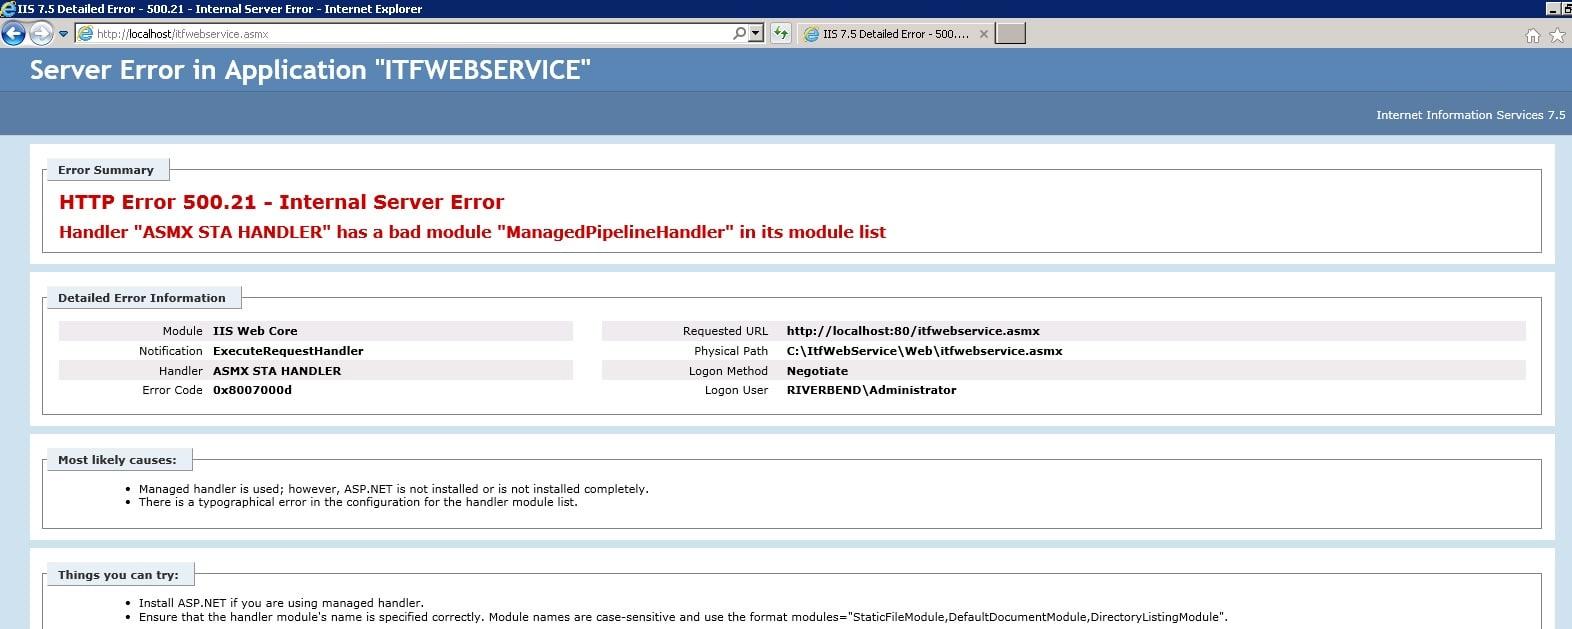 Setup of ASP NET web service on server using IIS - West Wind